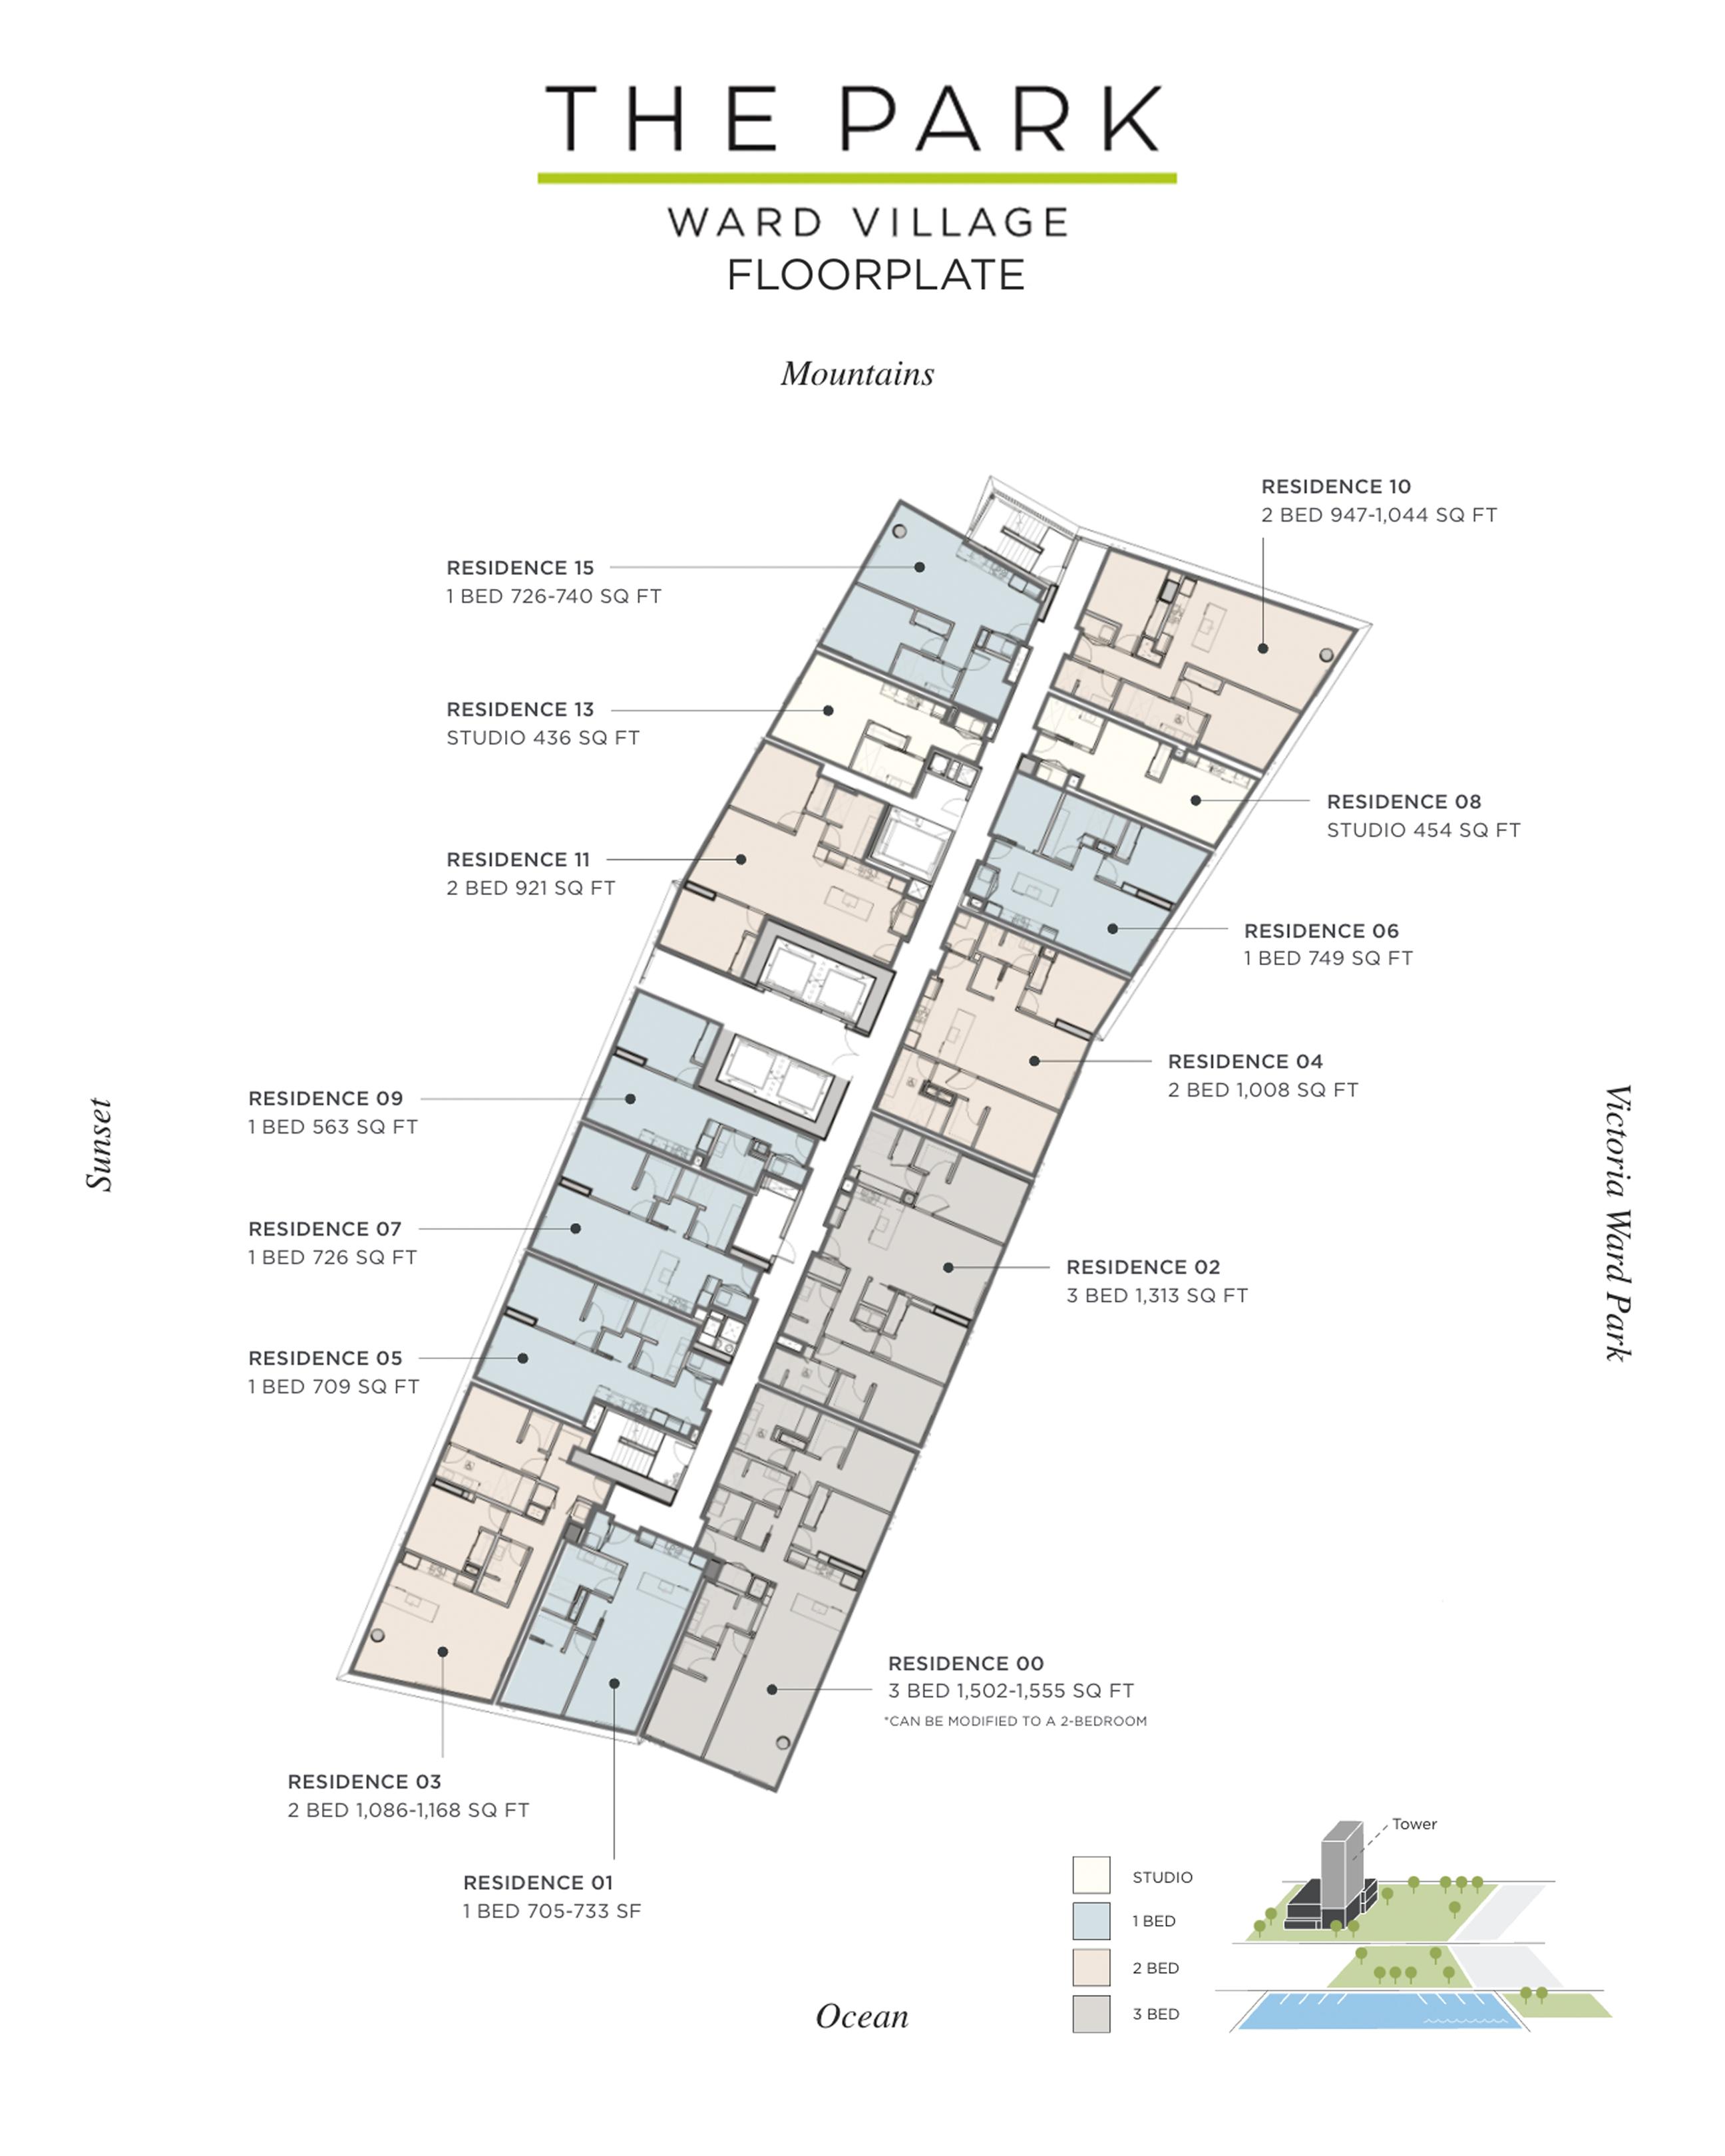 The Park Ward Village Floor Plan